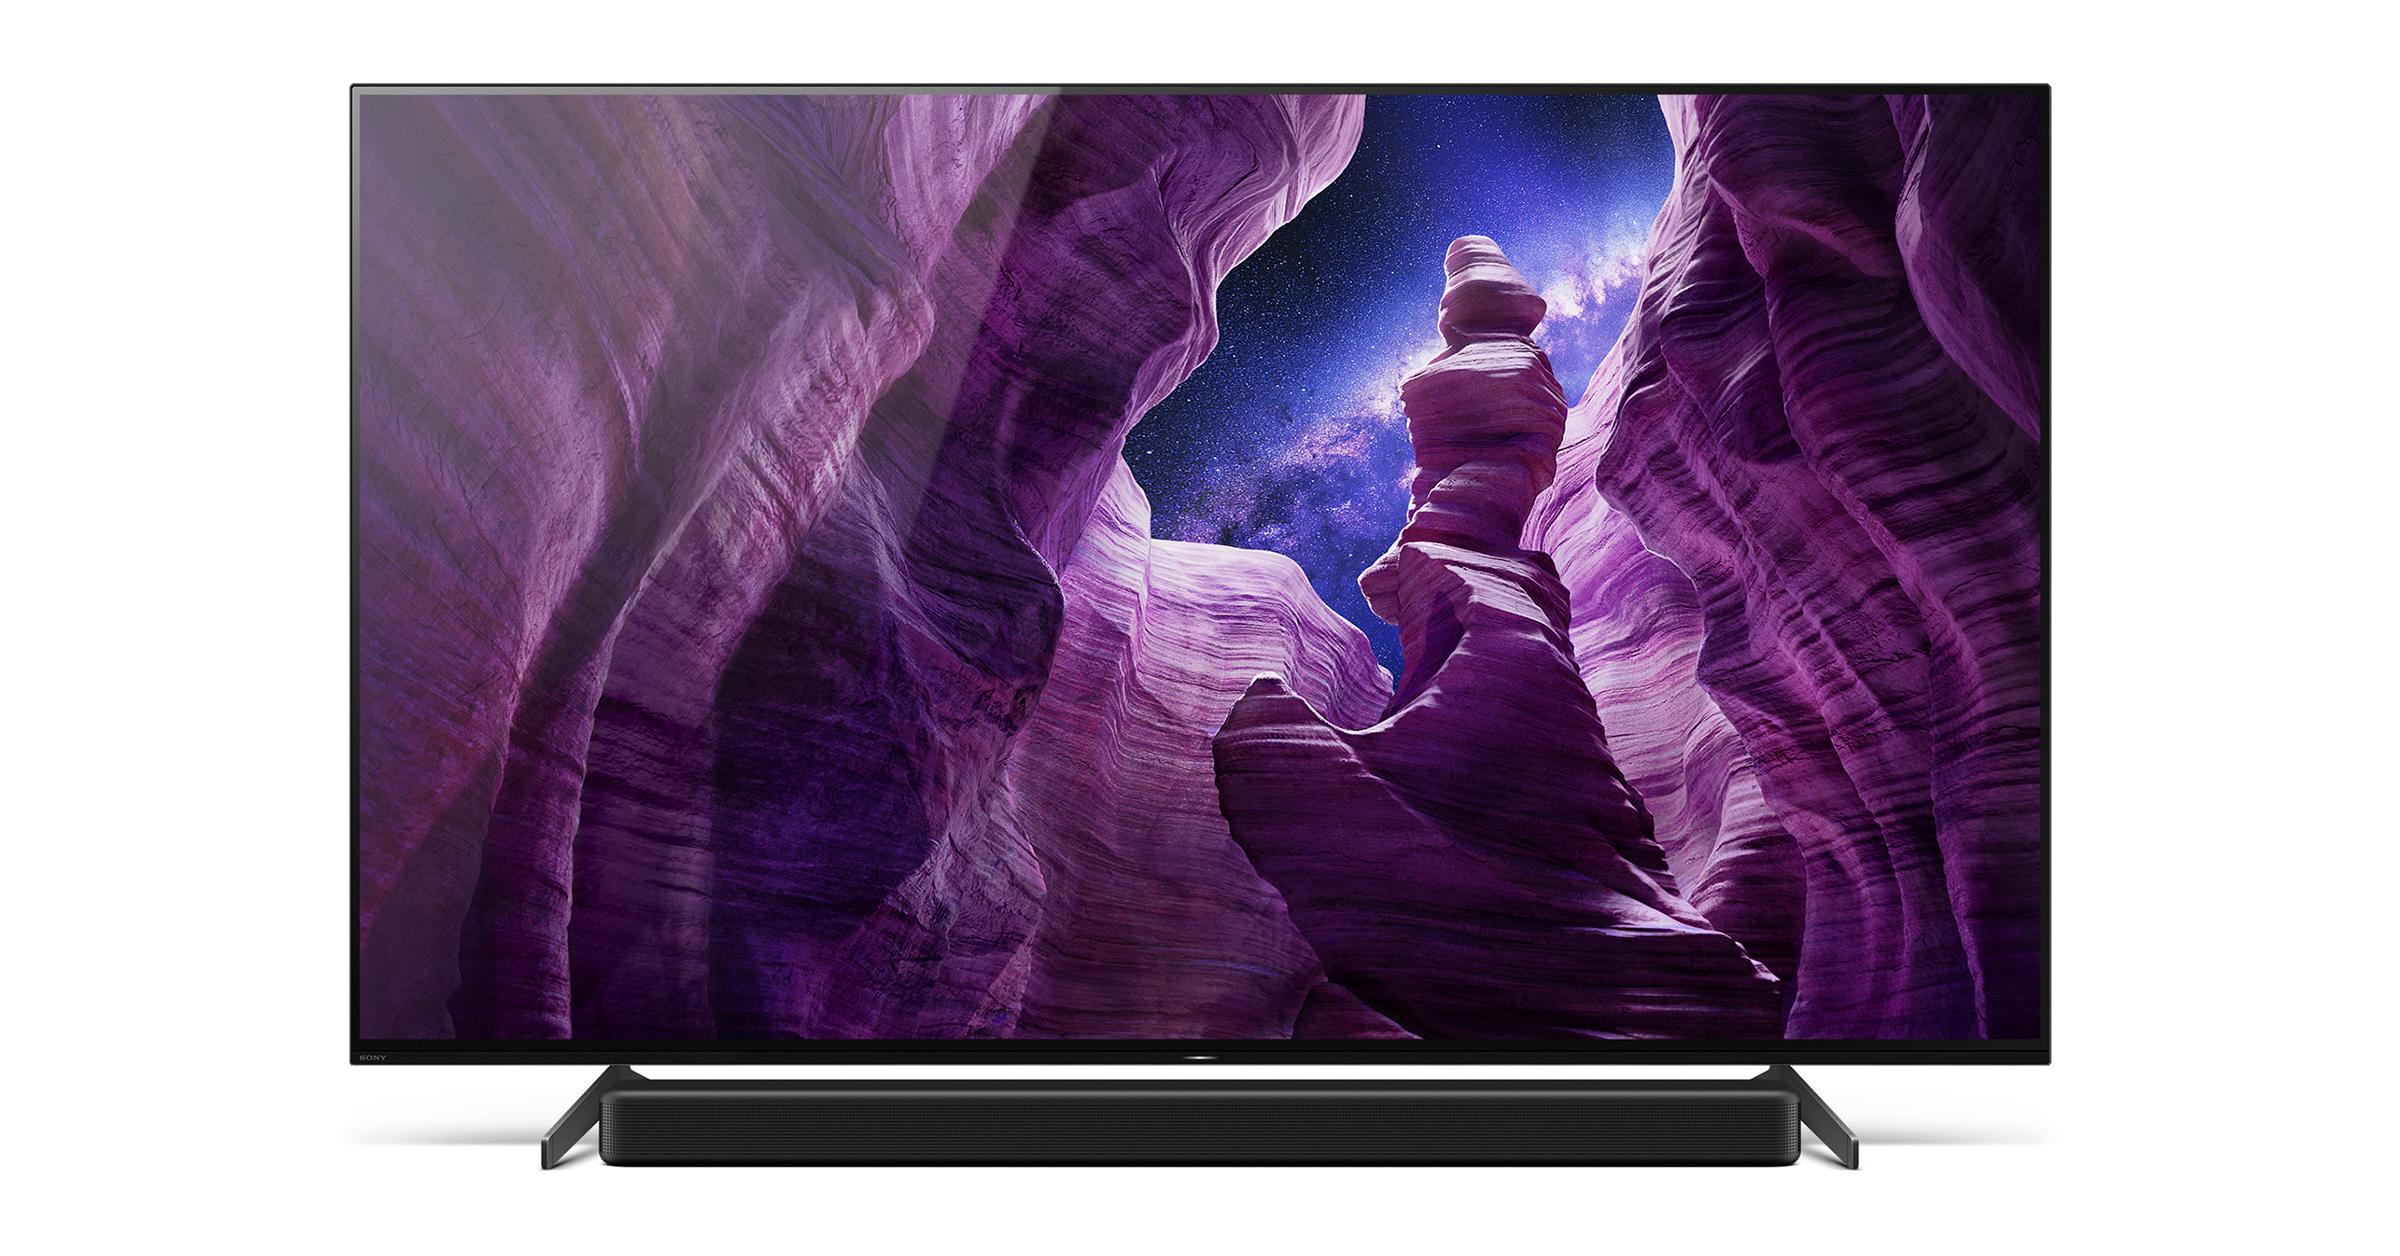 55/65吋雙規格!Sony BRAVIA 4K HDR OLED電視A8H系列在台灣登場